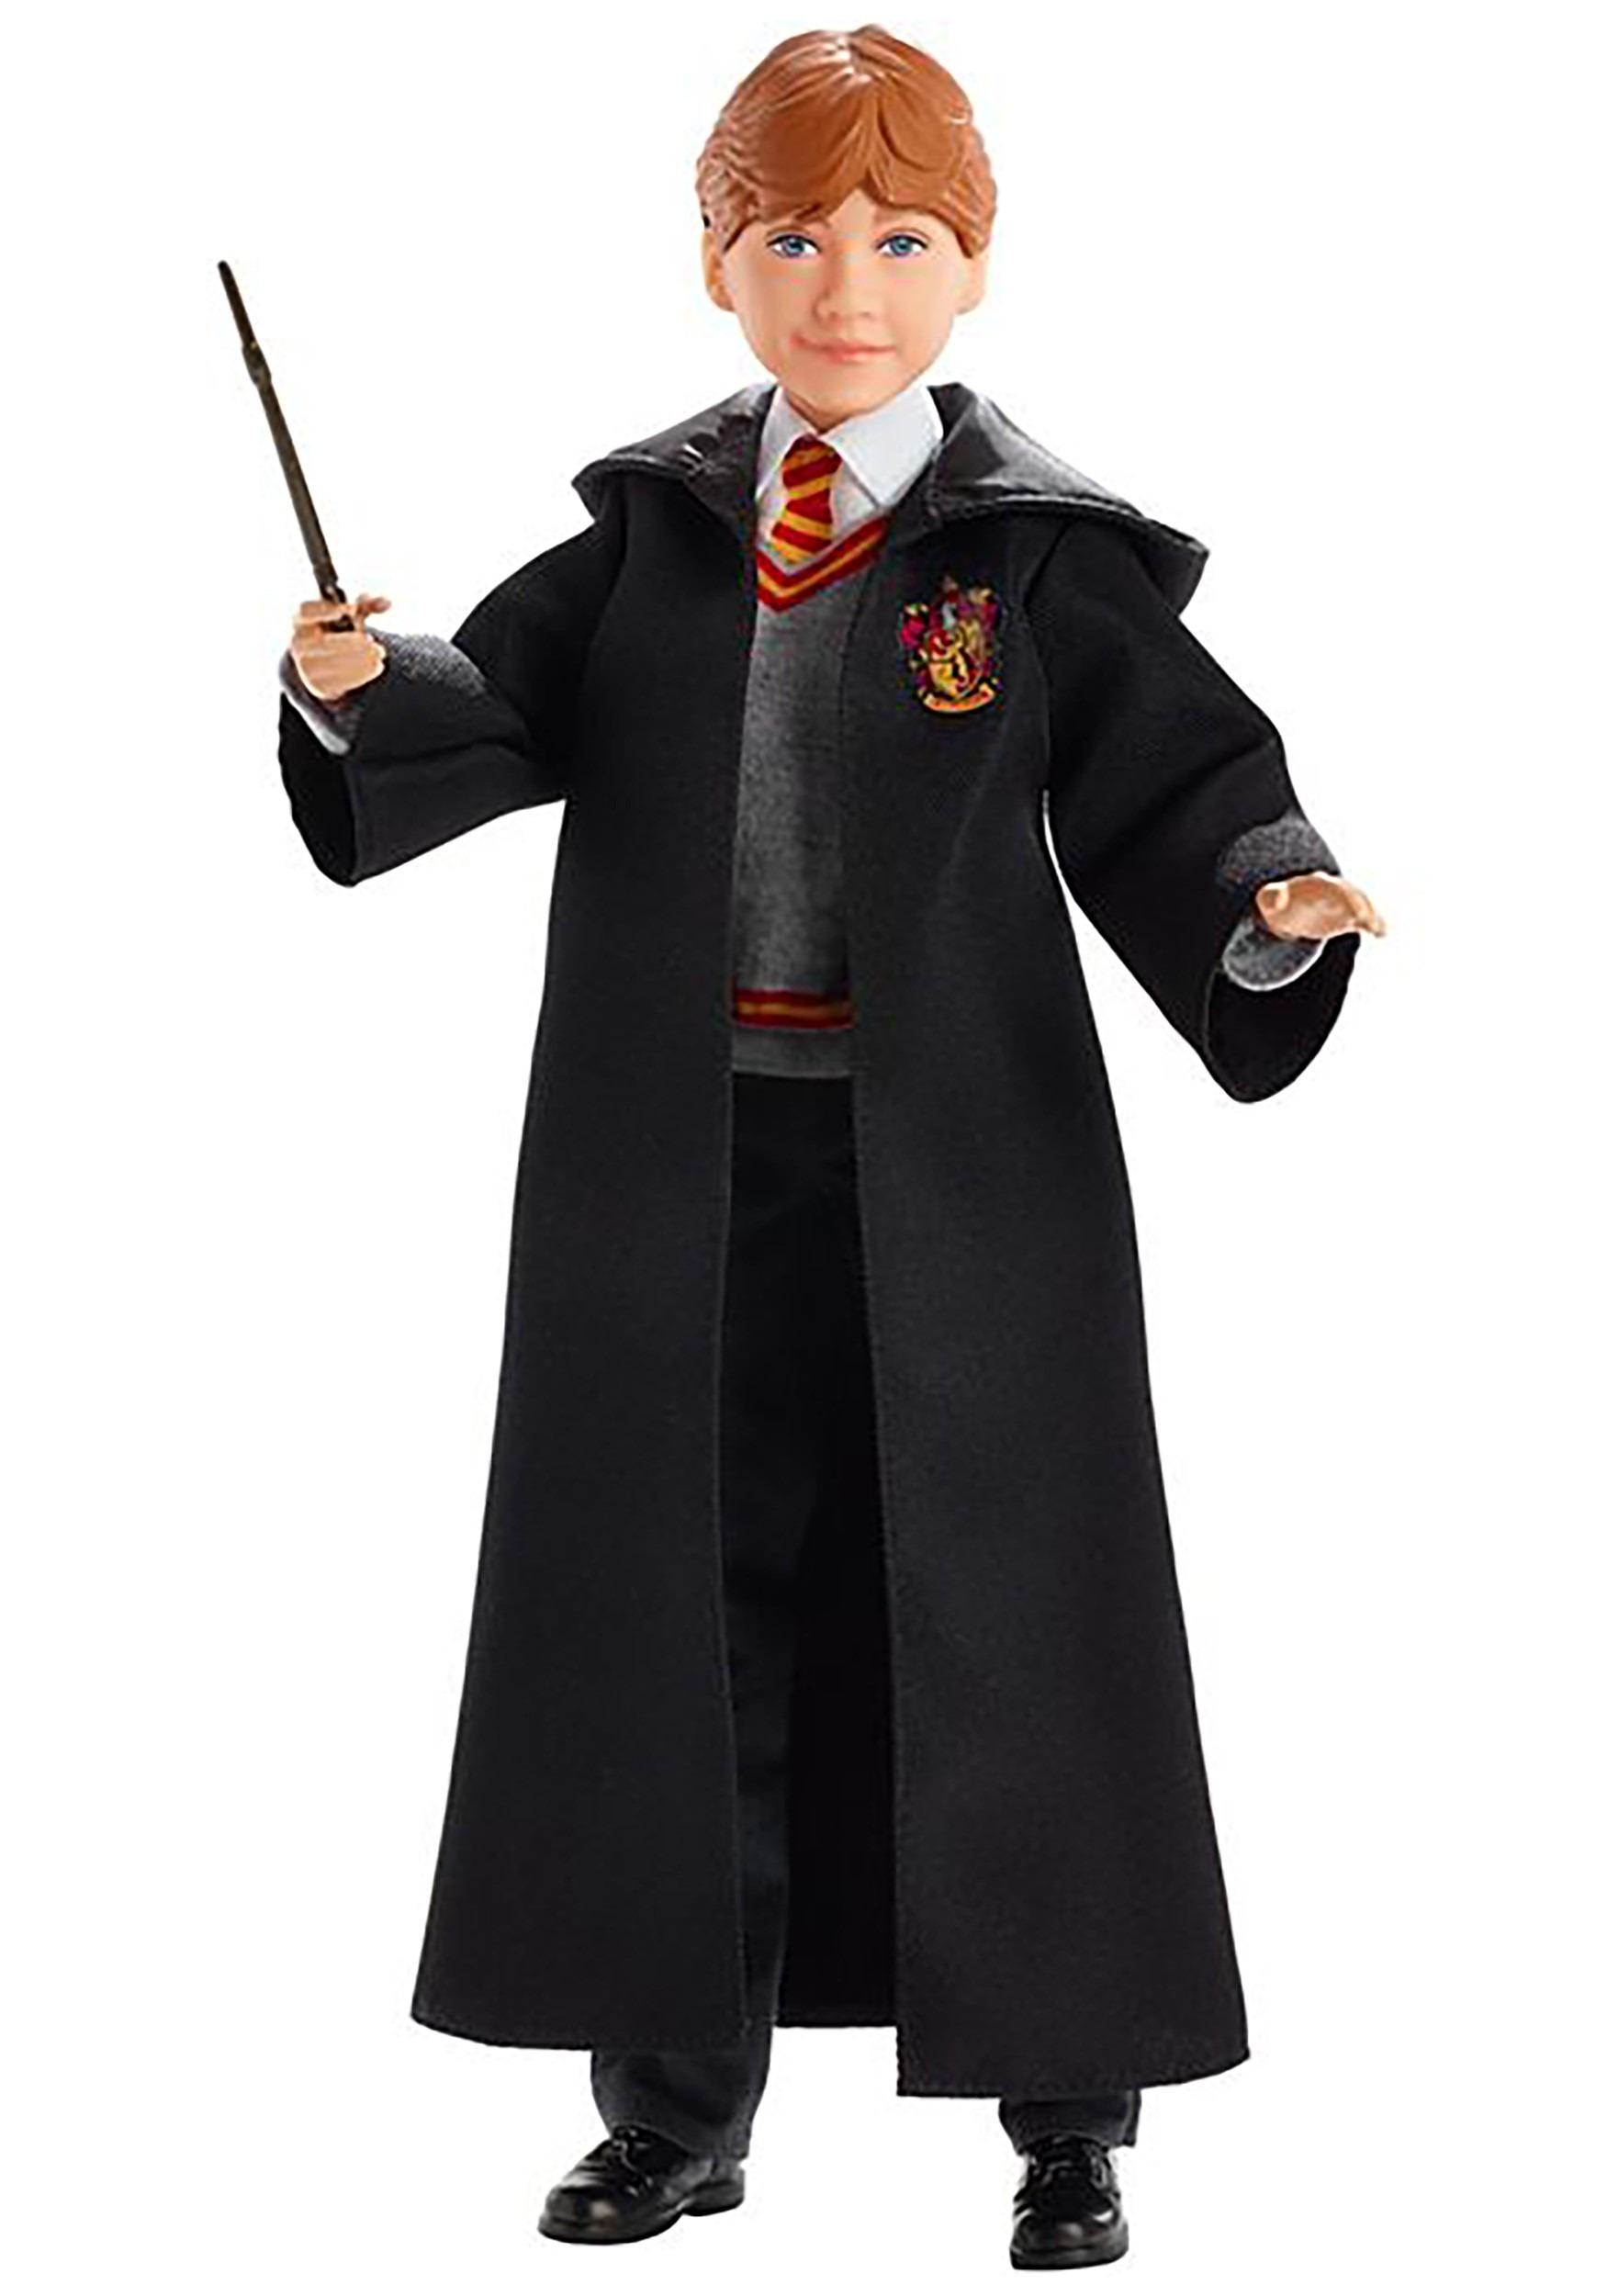 Ron Weasley Harry Potter Doll